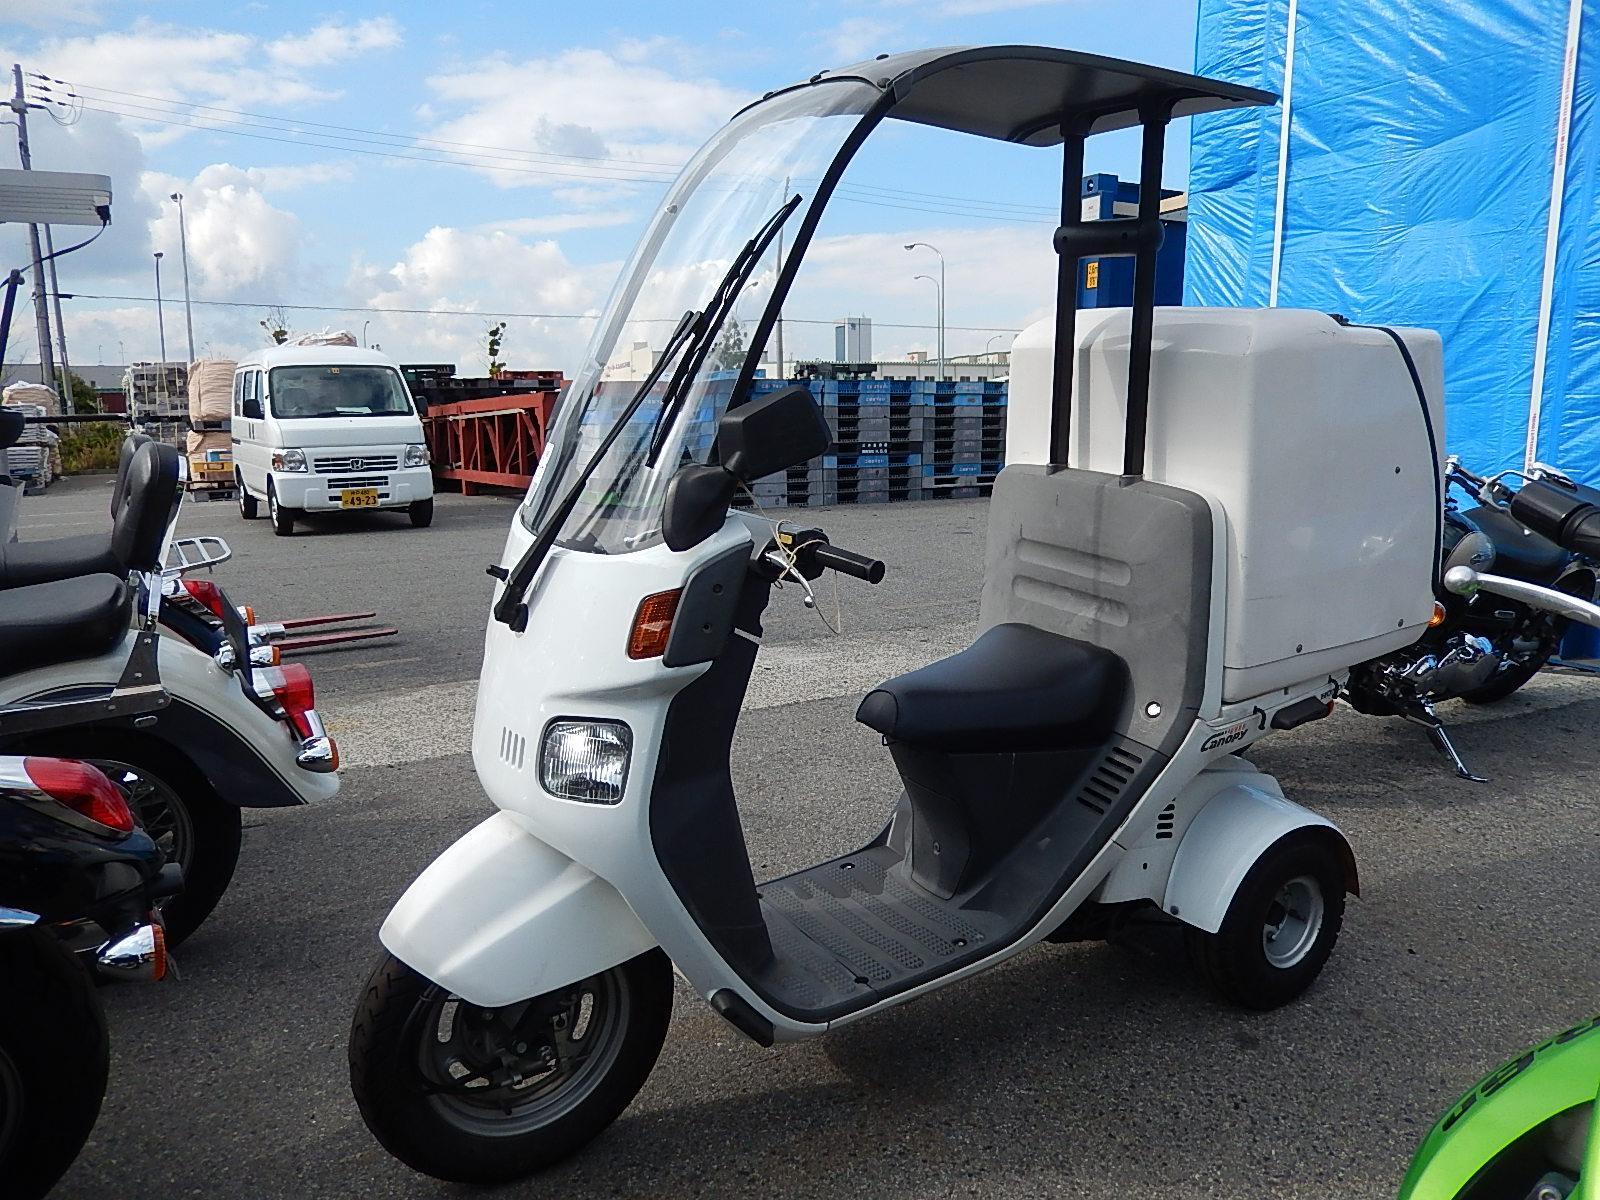 Продажа ретро скутеров бу Honda, Yamaha, Suzuki